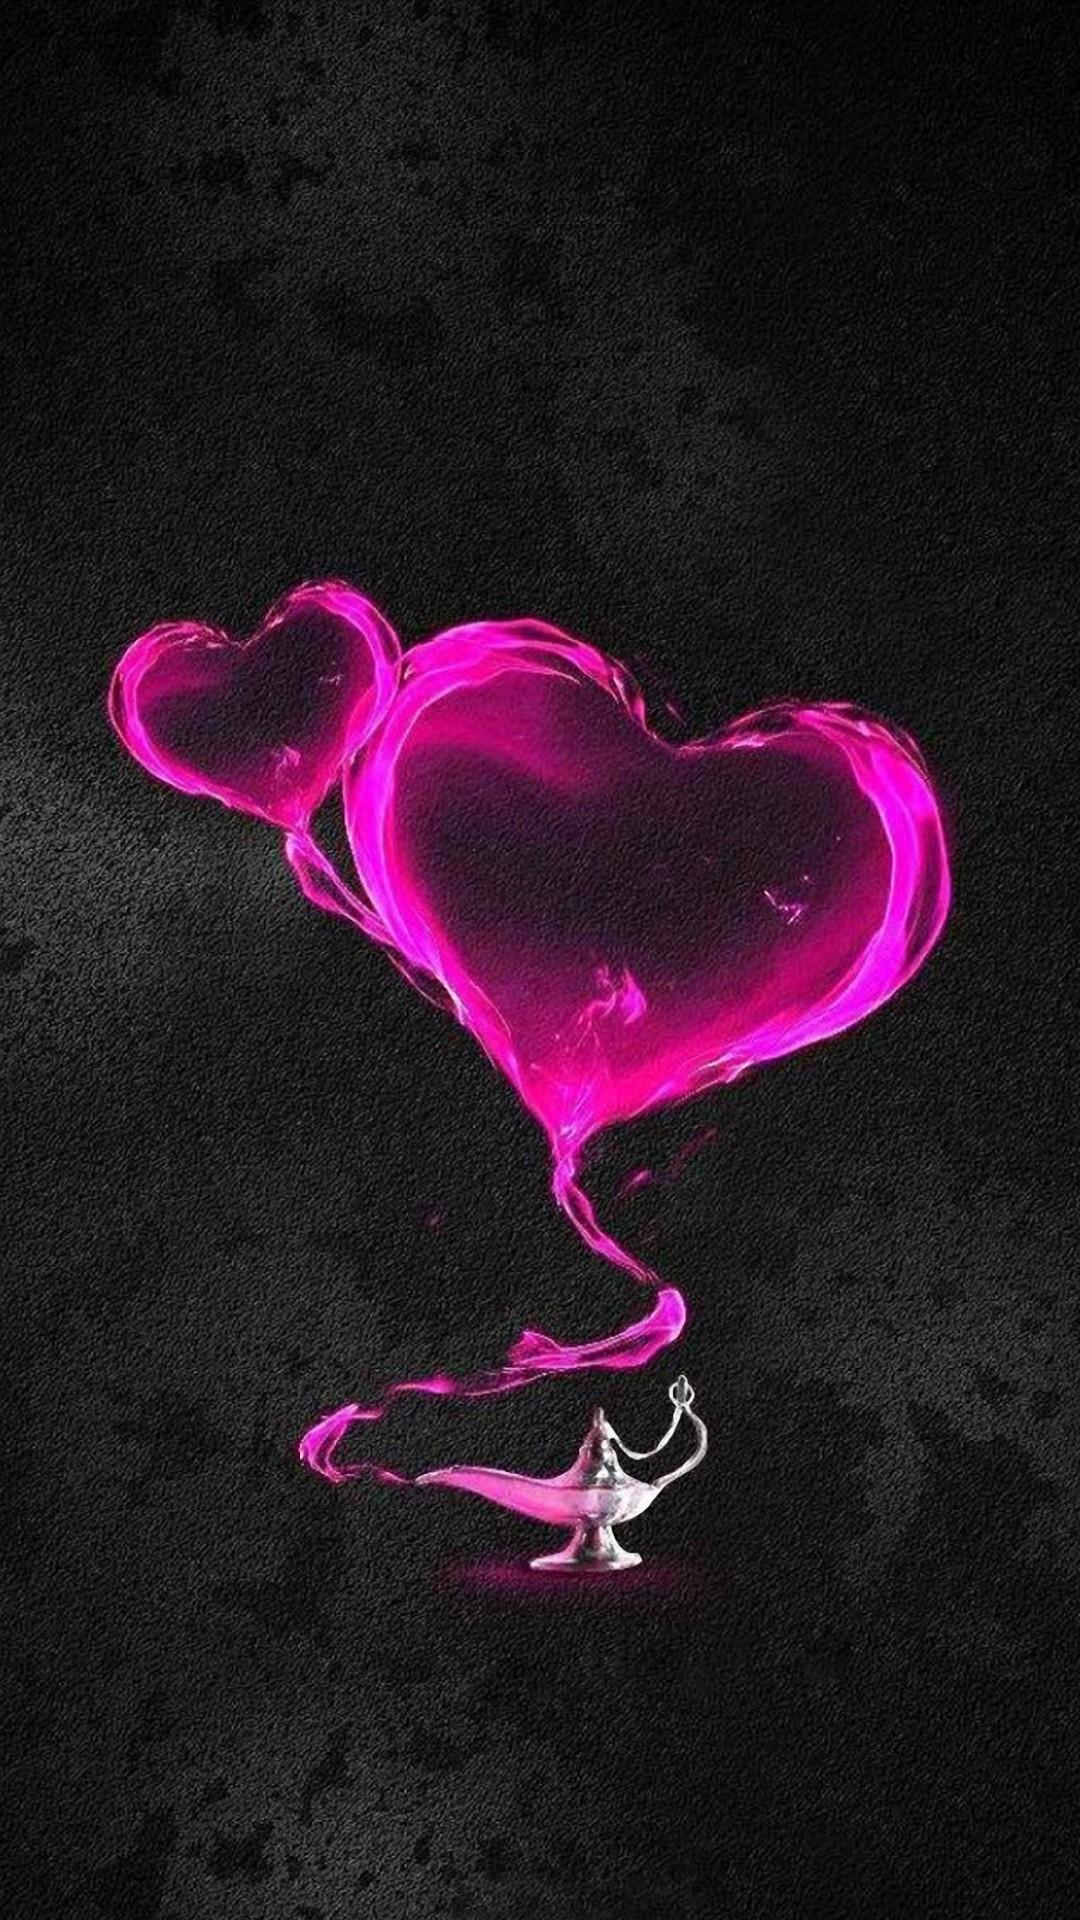 Cool Pink Iphone Wallpaper Free Download.